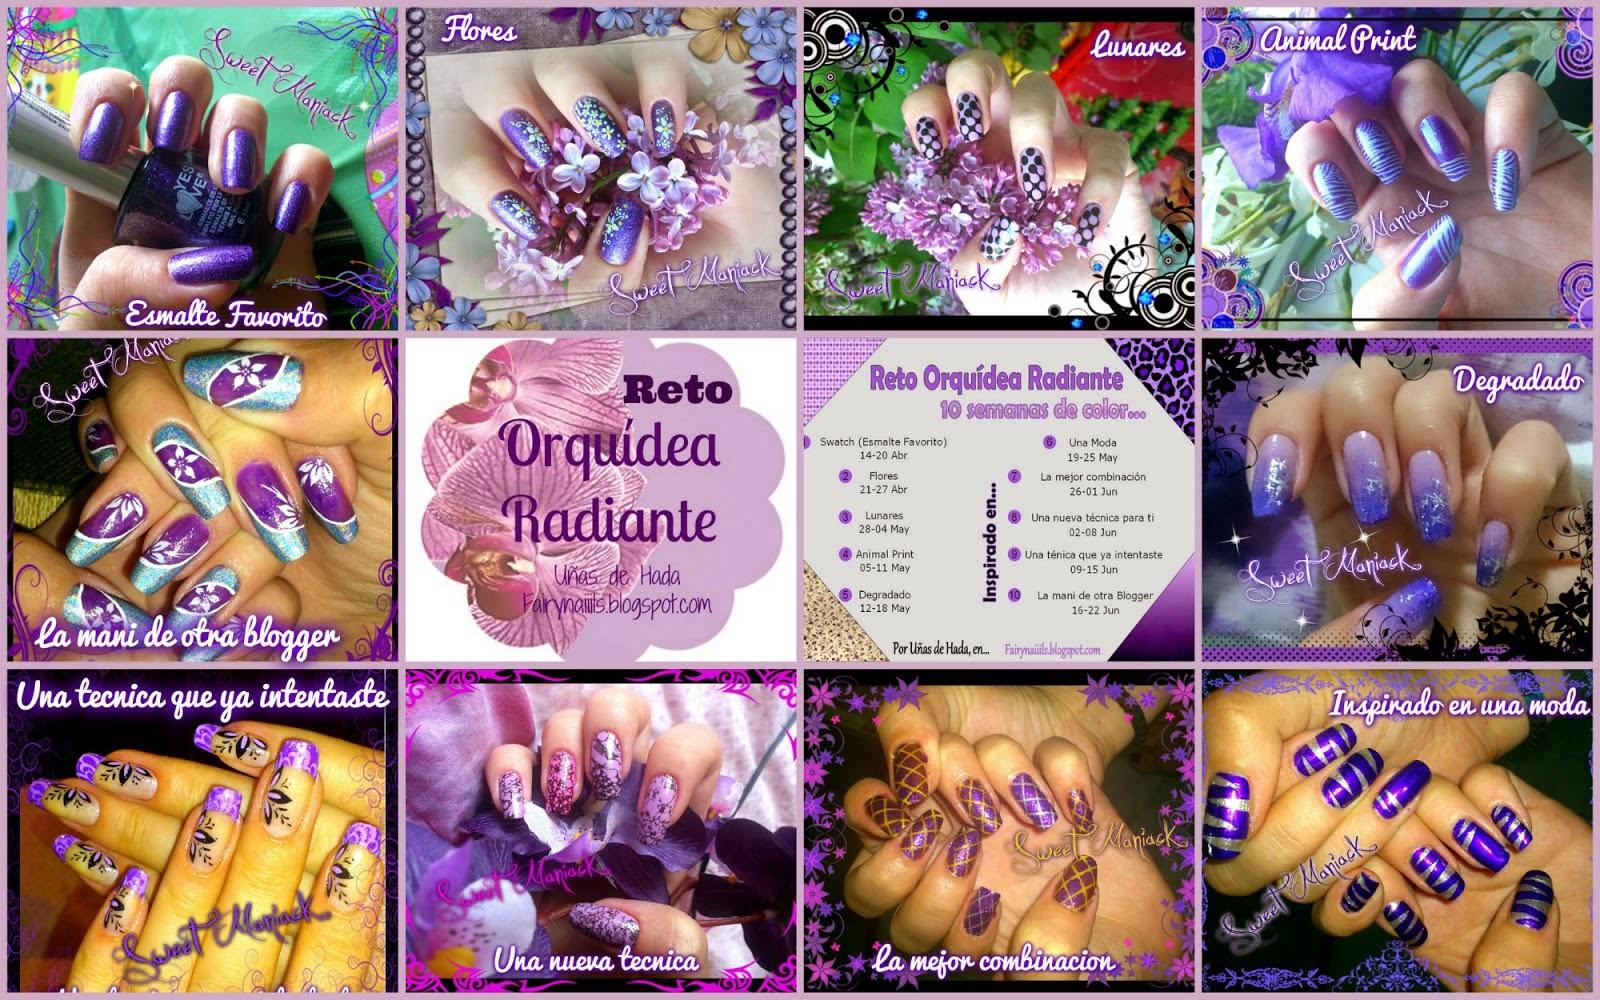 Reto Orquidea Radiante